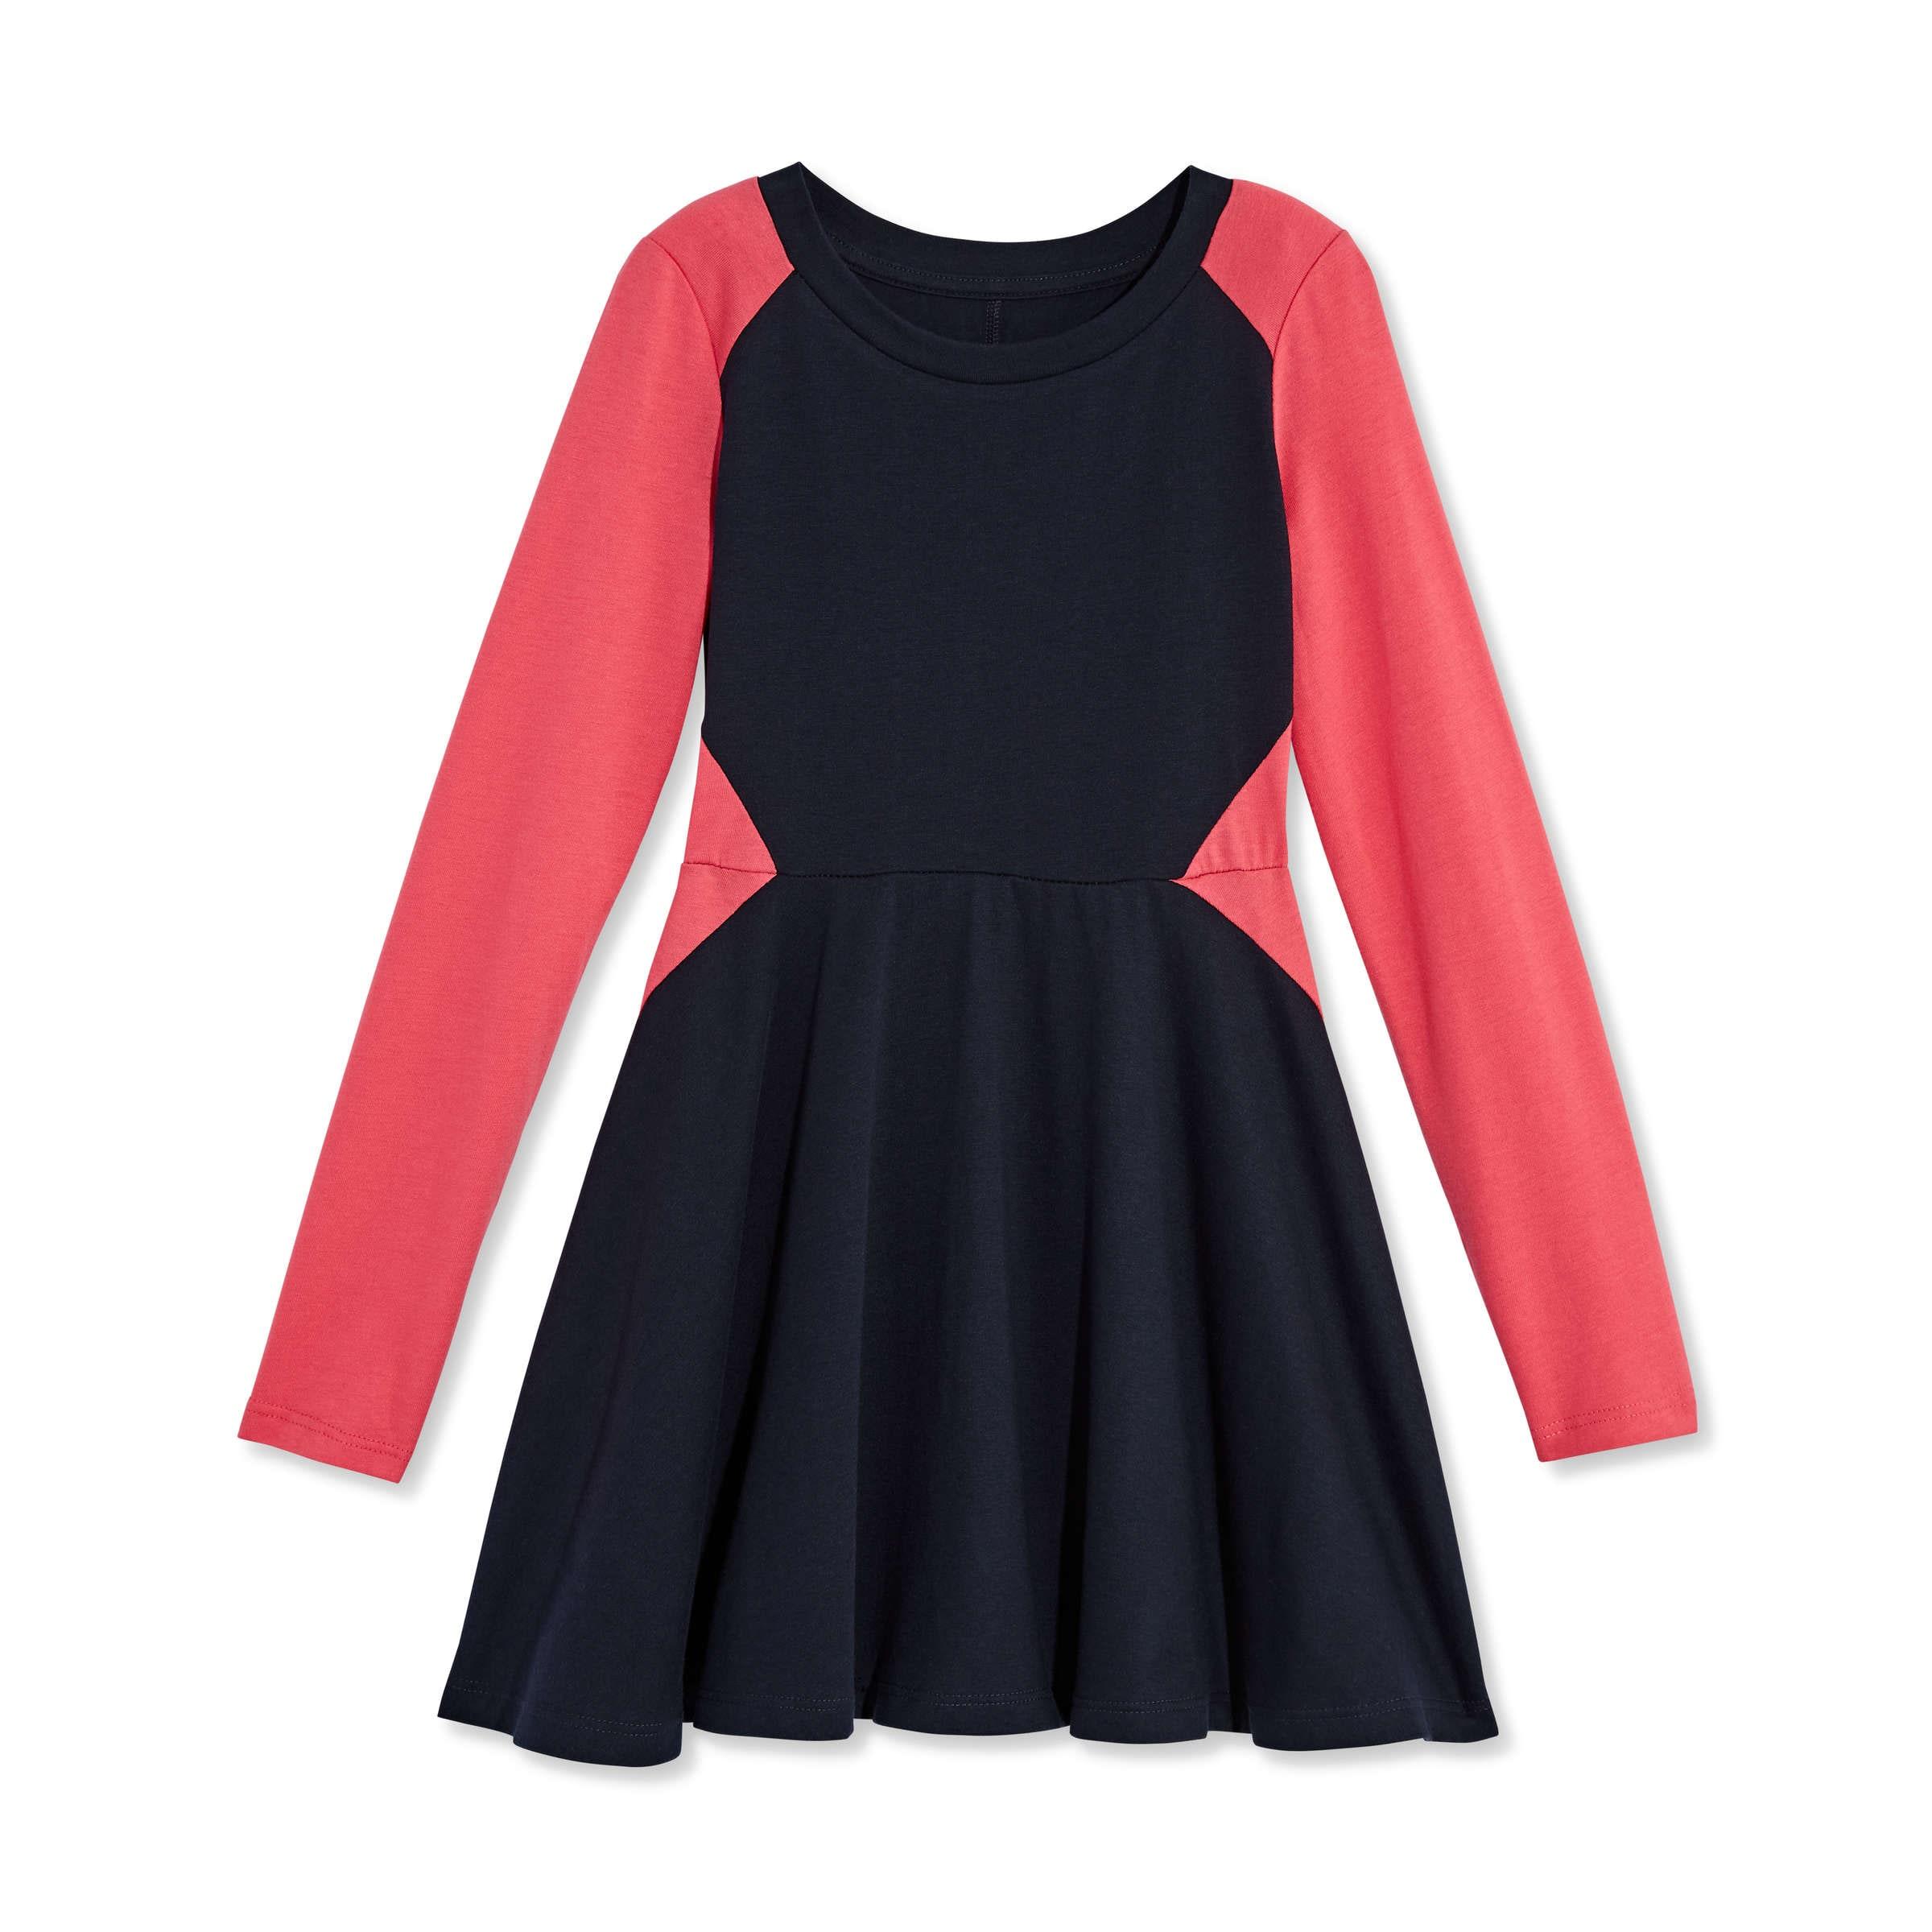 Kid Girls  Skater Dress in JF Midnight Blue from Joe Fresh 656c95cb0